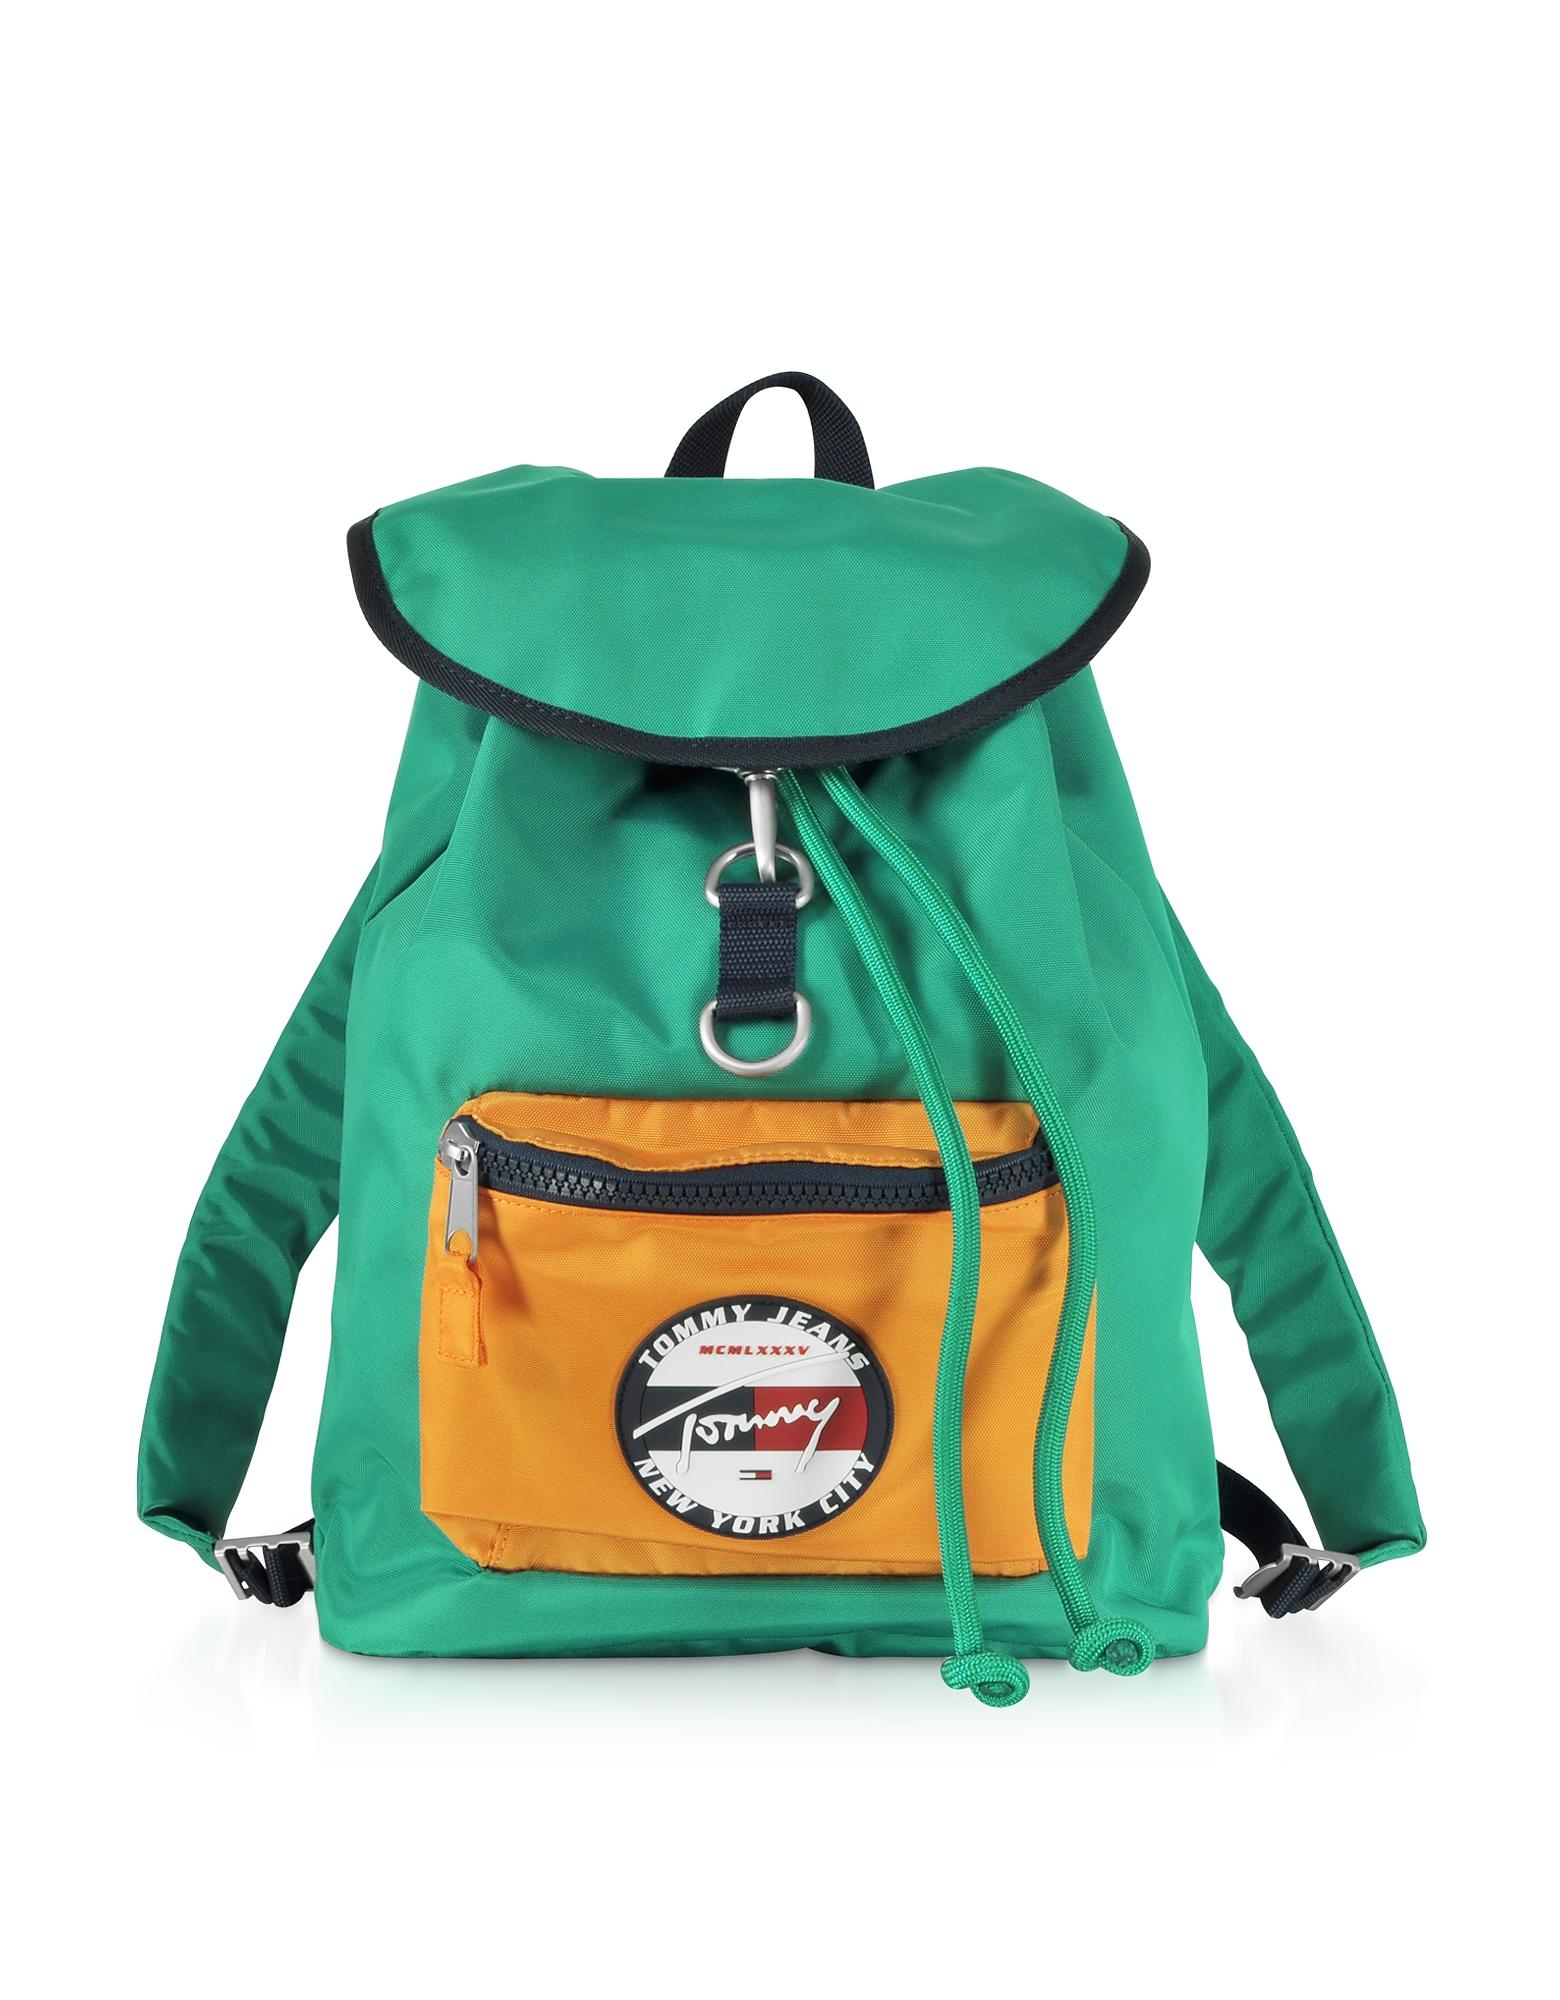 The Heritage Aqua Fabric Backpack